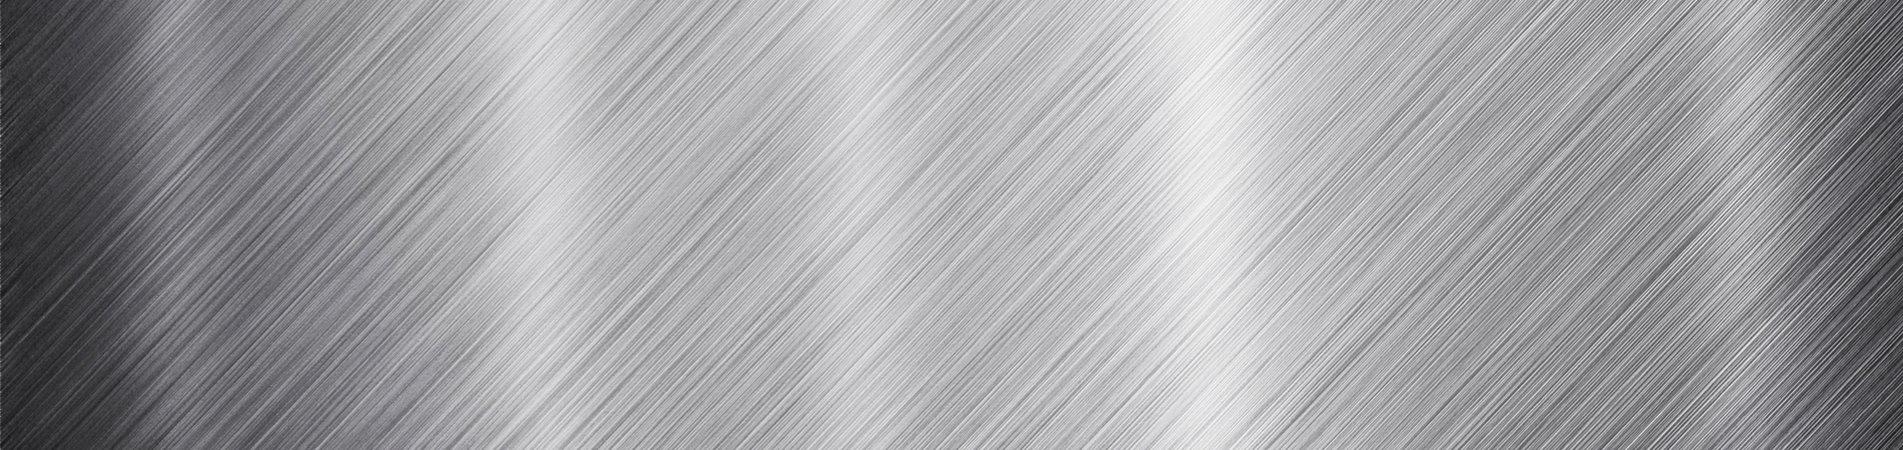 Fondo corte laser Hidegar